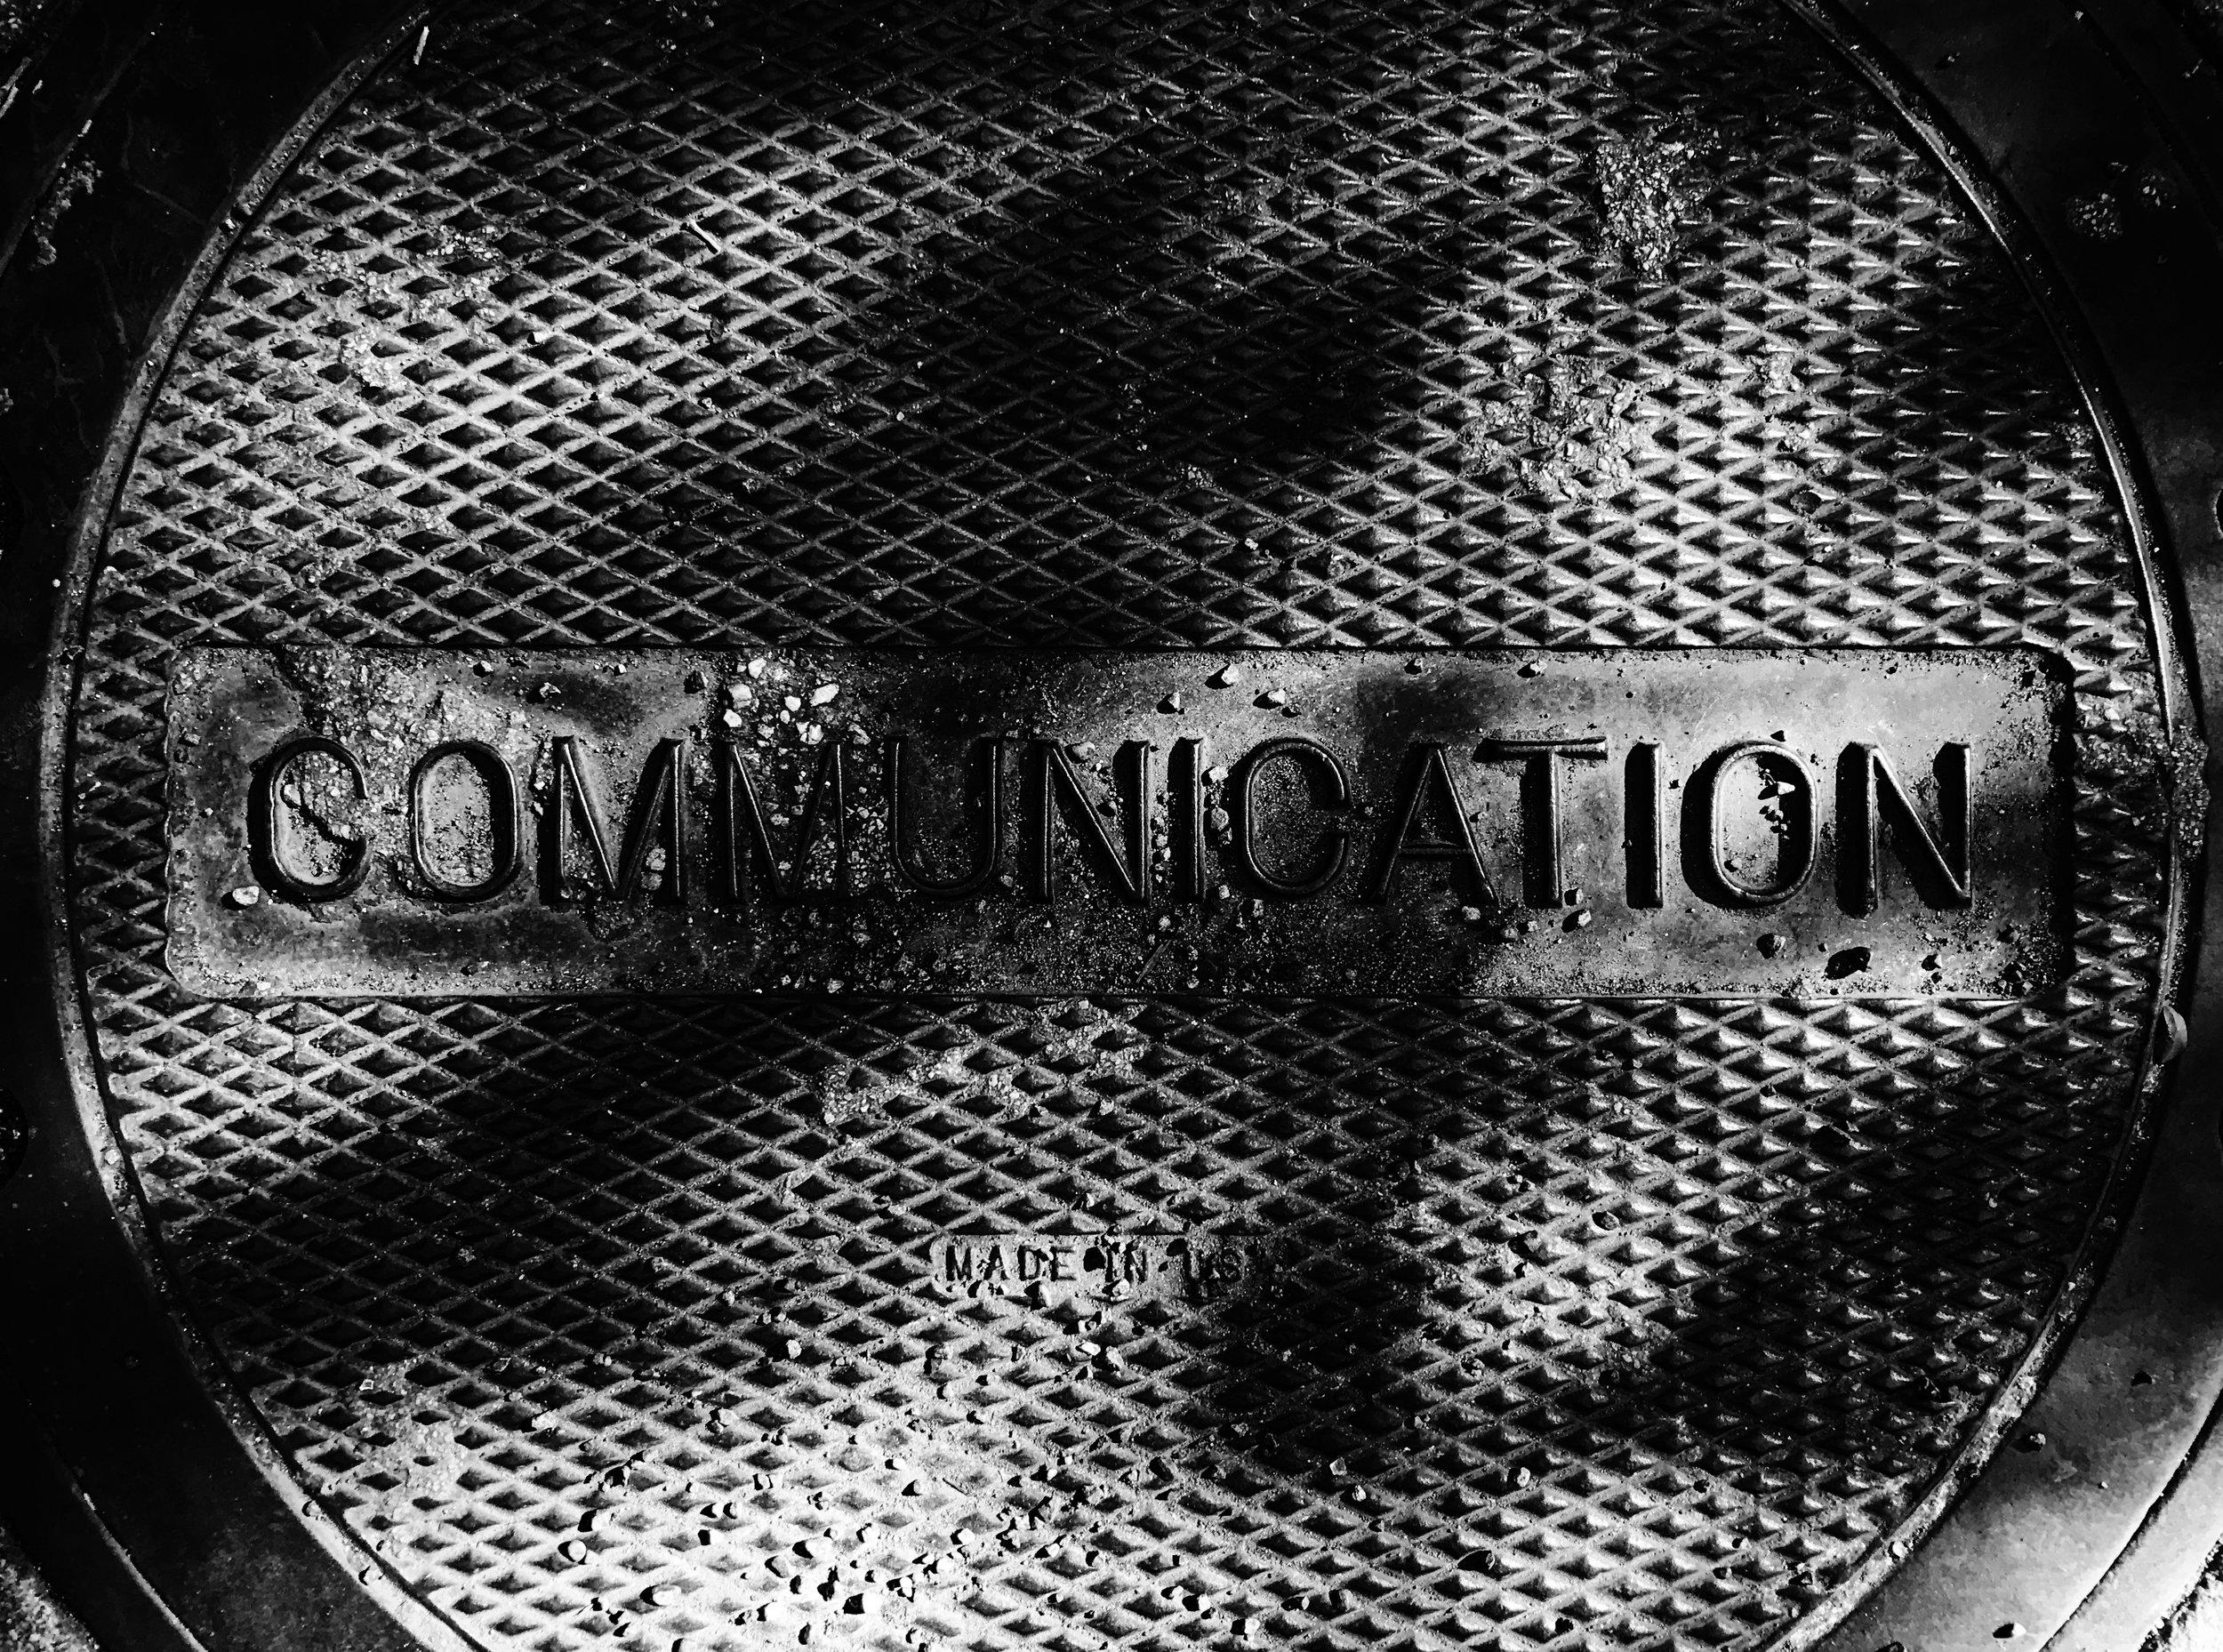 Communication, Chicago, 7/2/2017